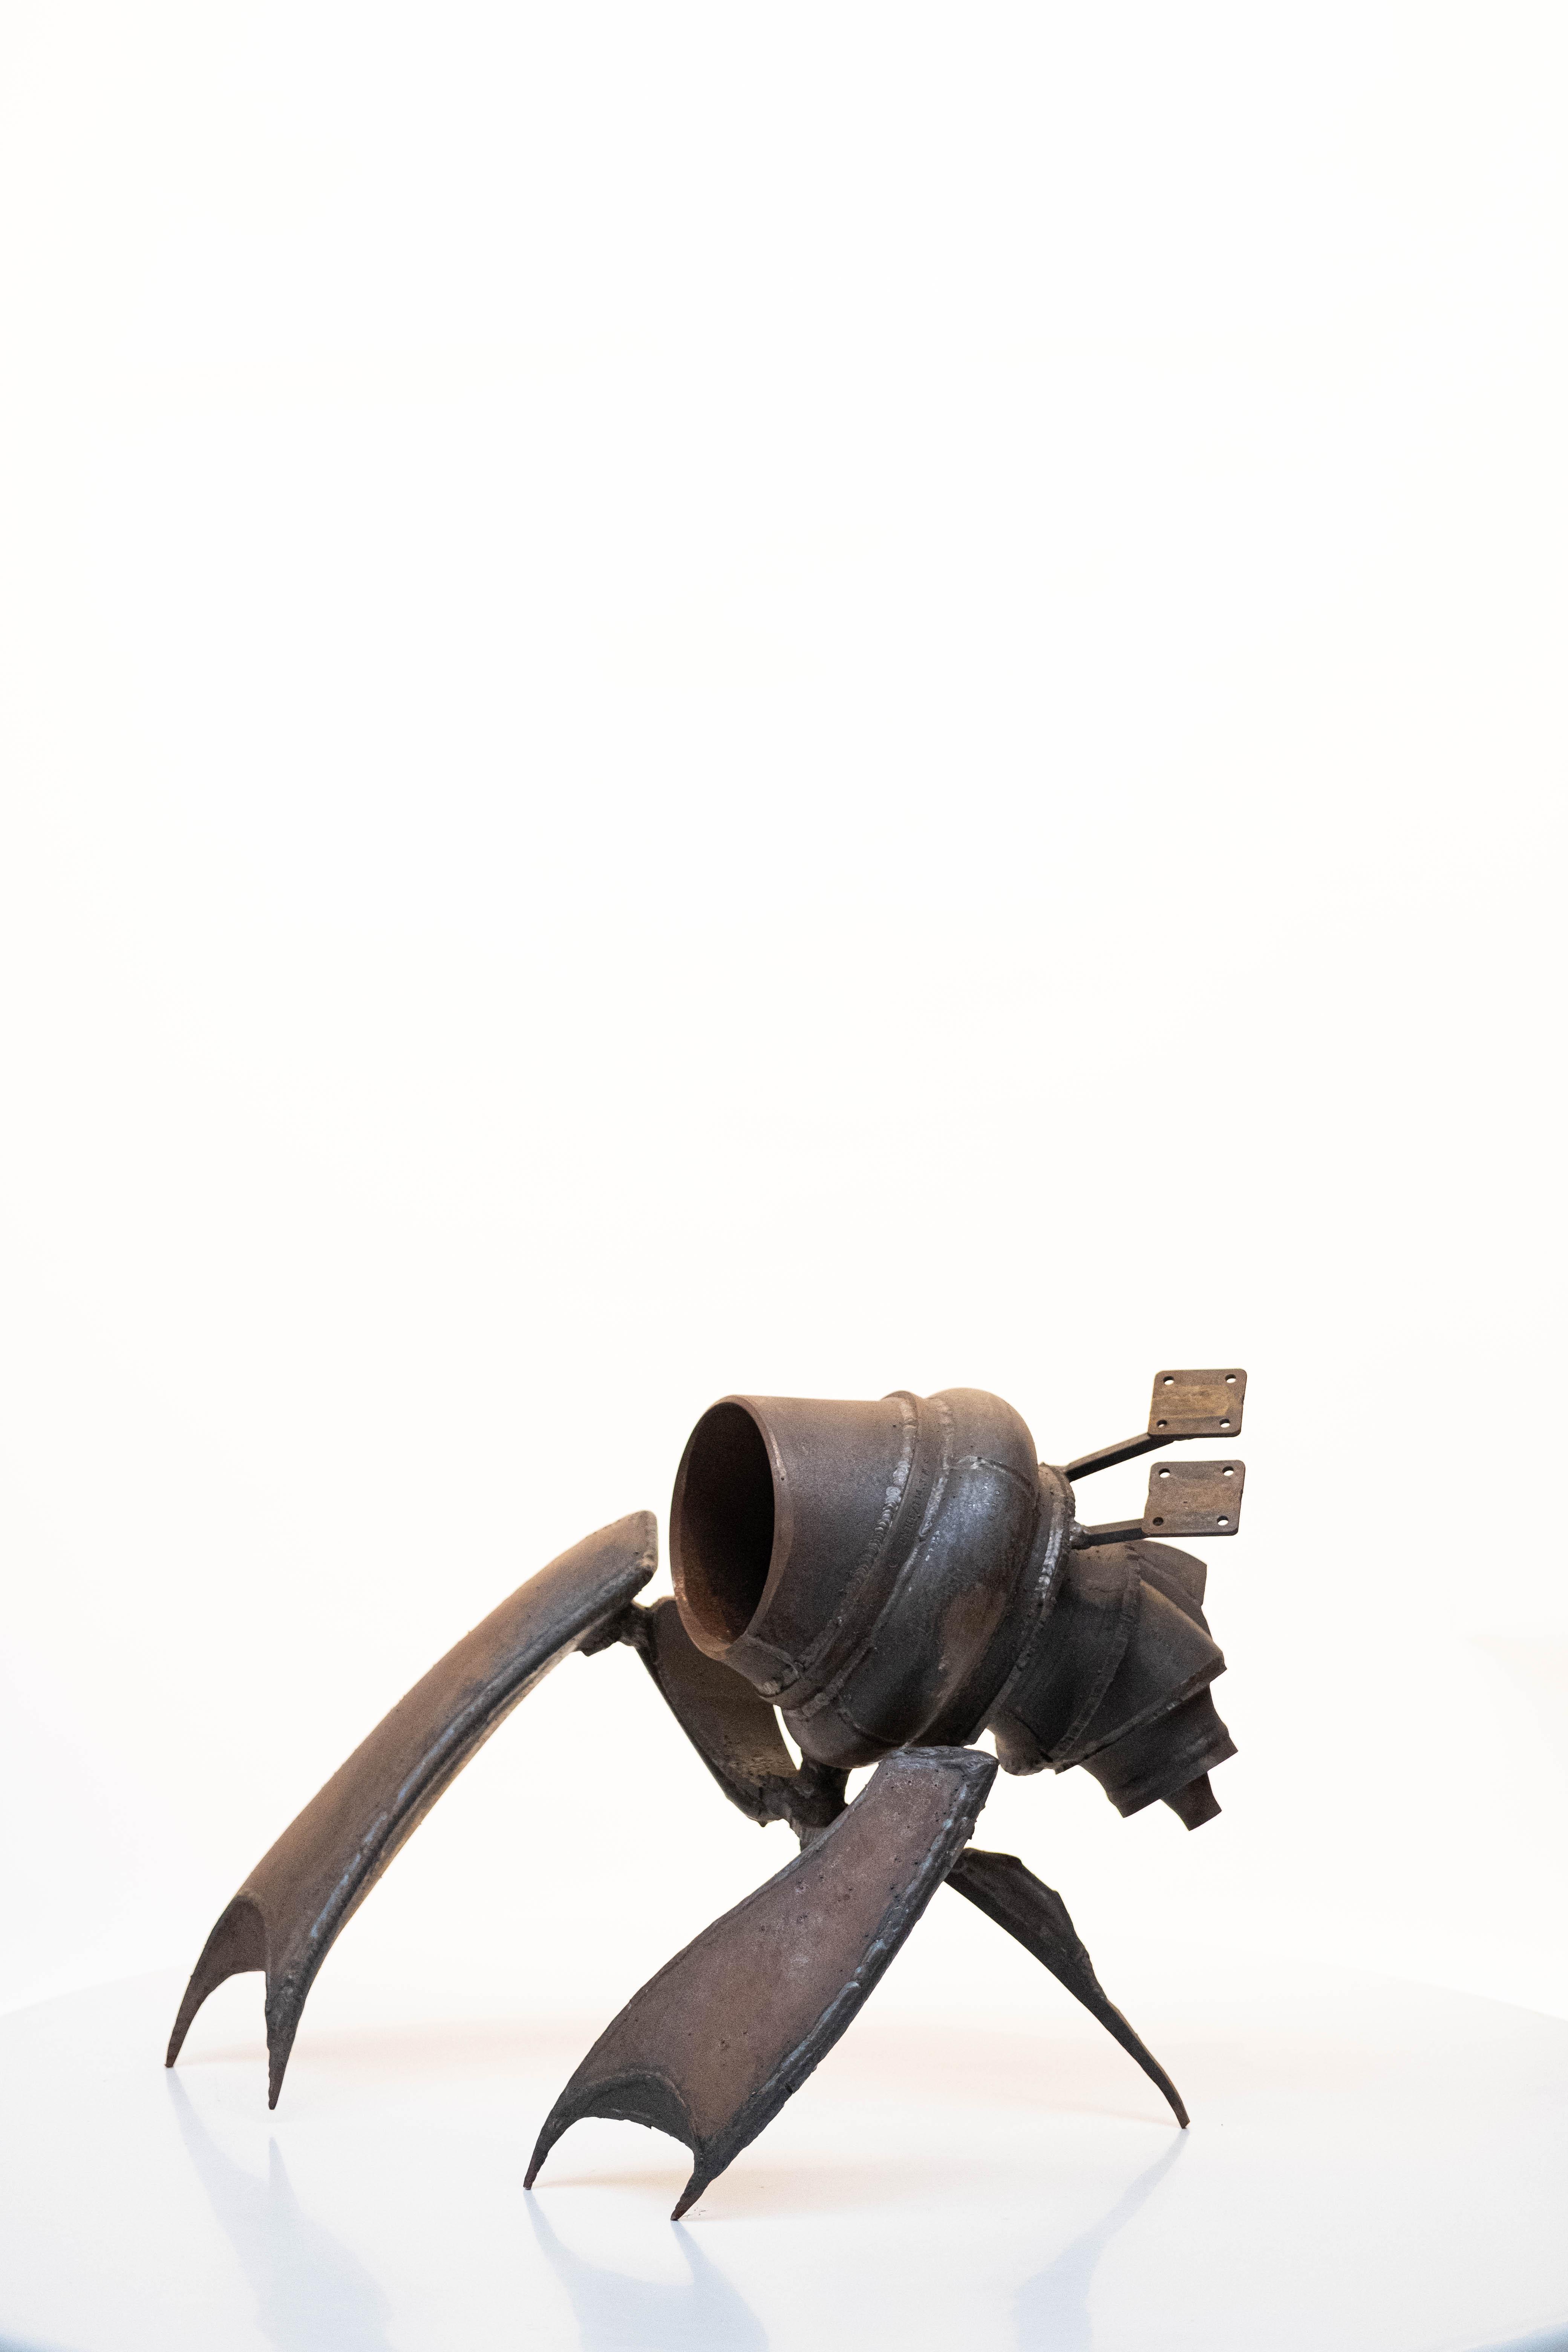 sculpture metal decoration outdoor design art crab